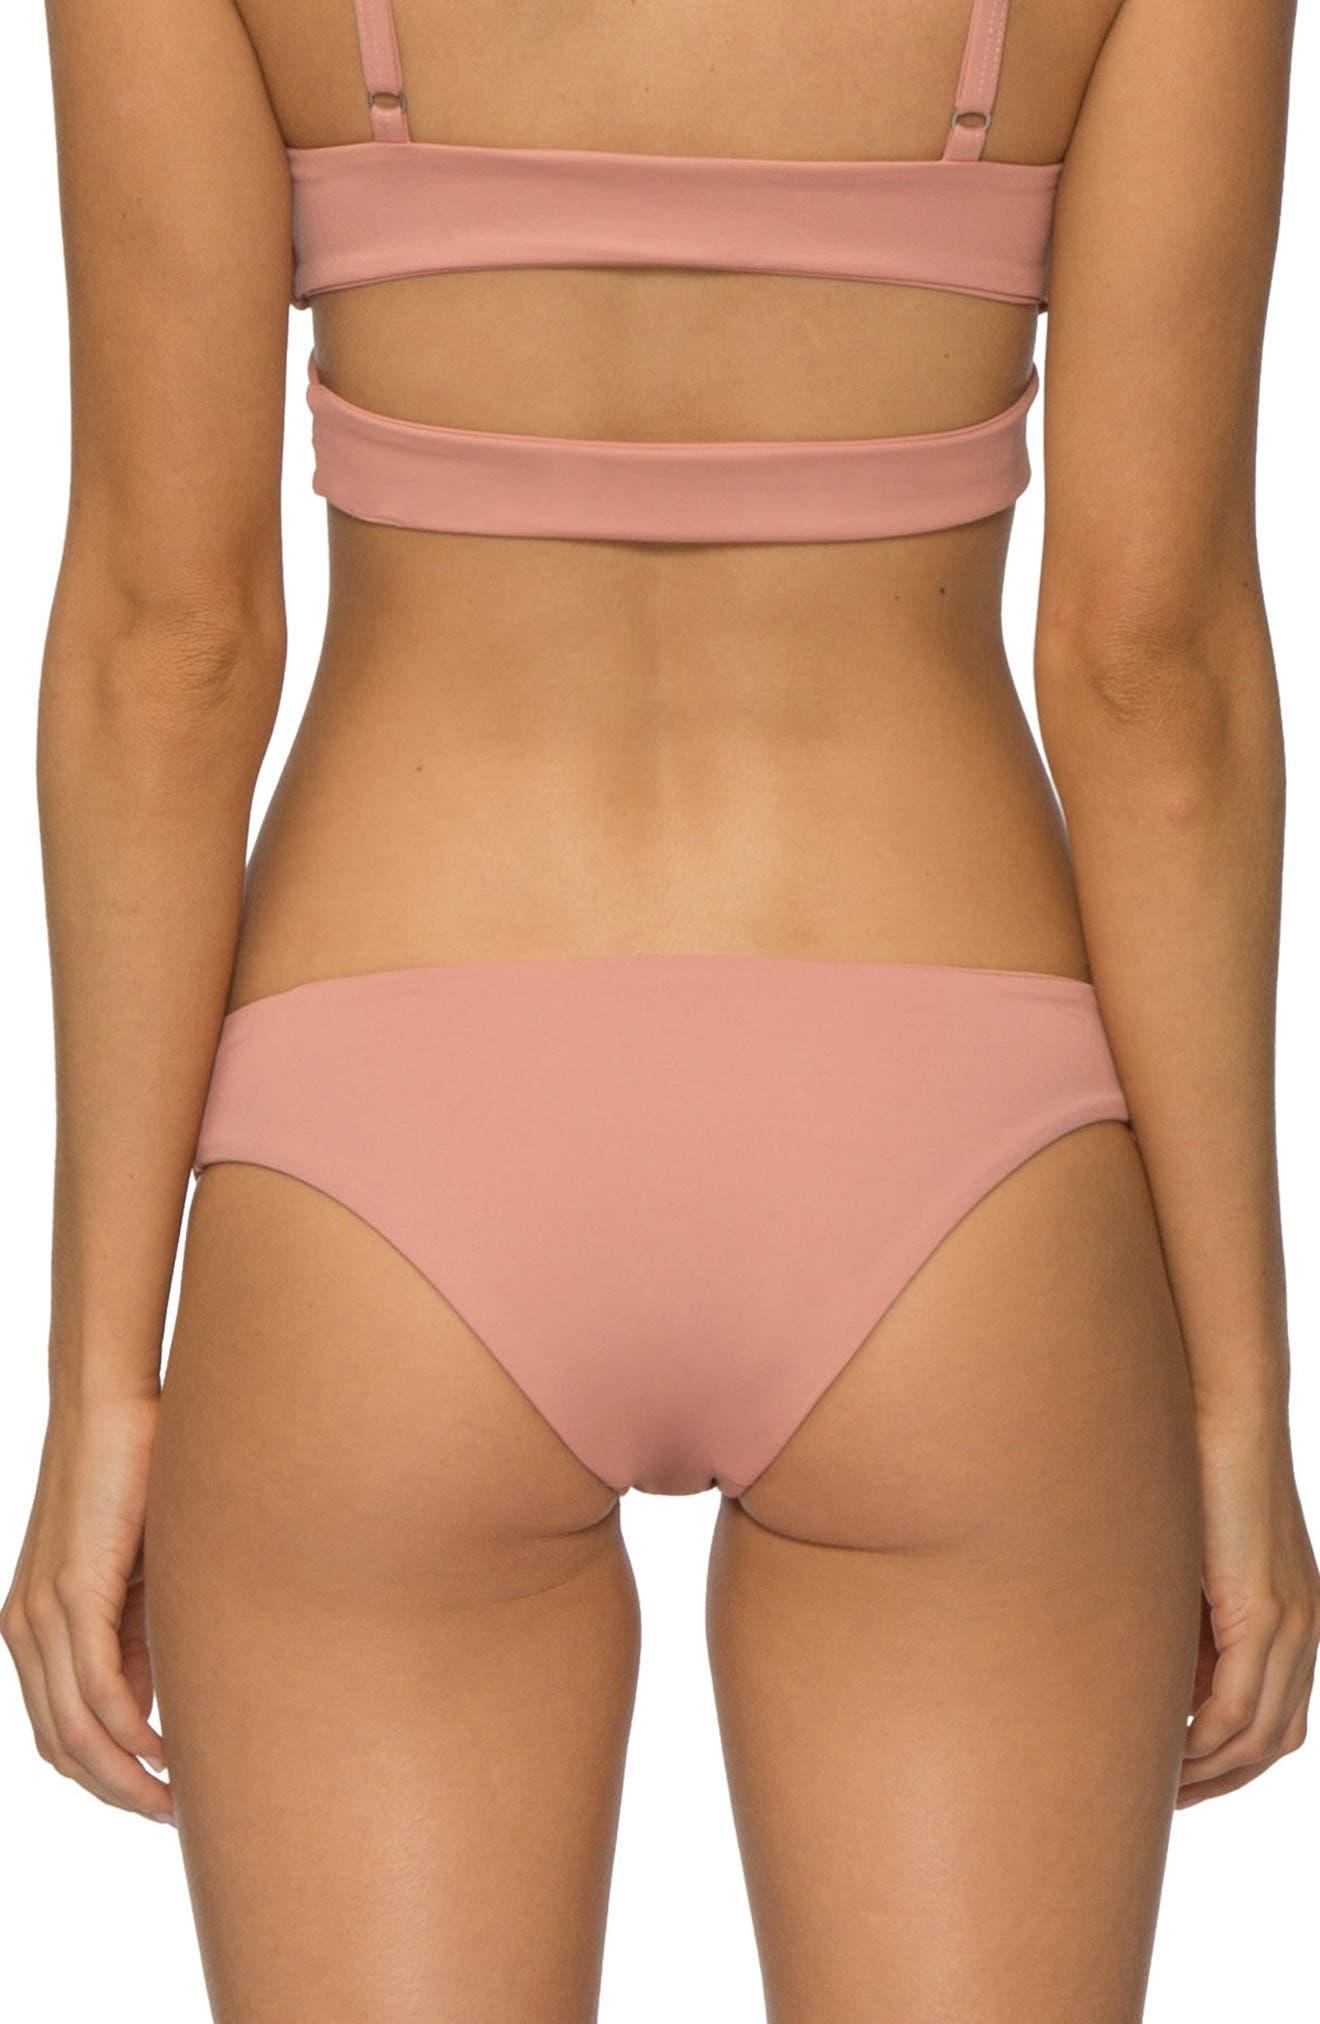 'Ali' Moderate Coverage Bikini Bottoms,                             Alternate thumbnail 2, color,                             ROSE DAWN